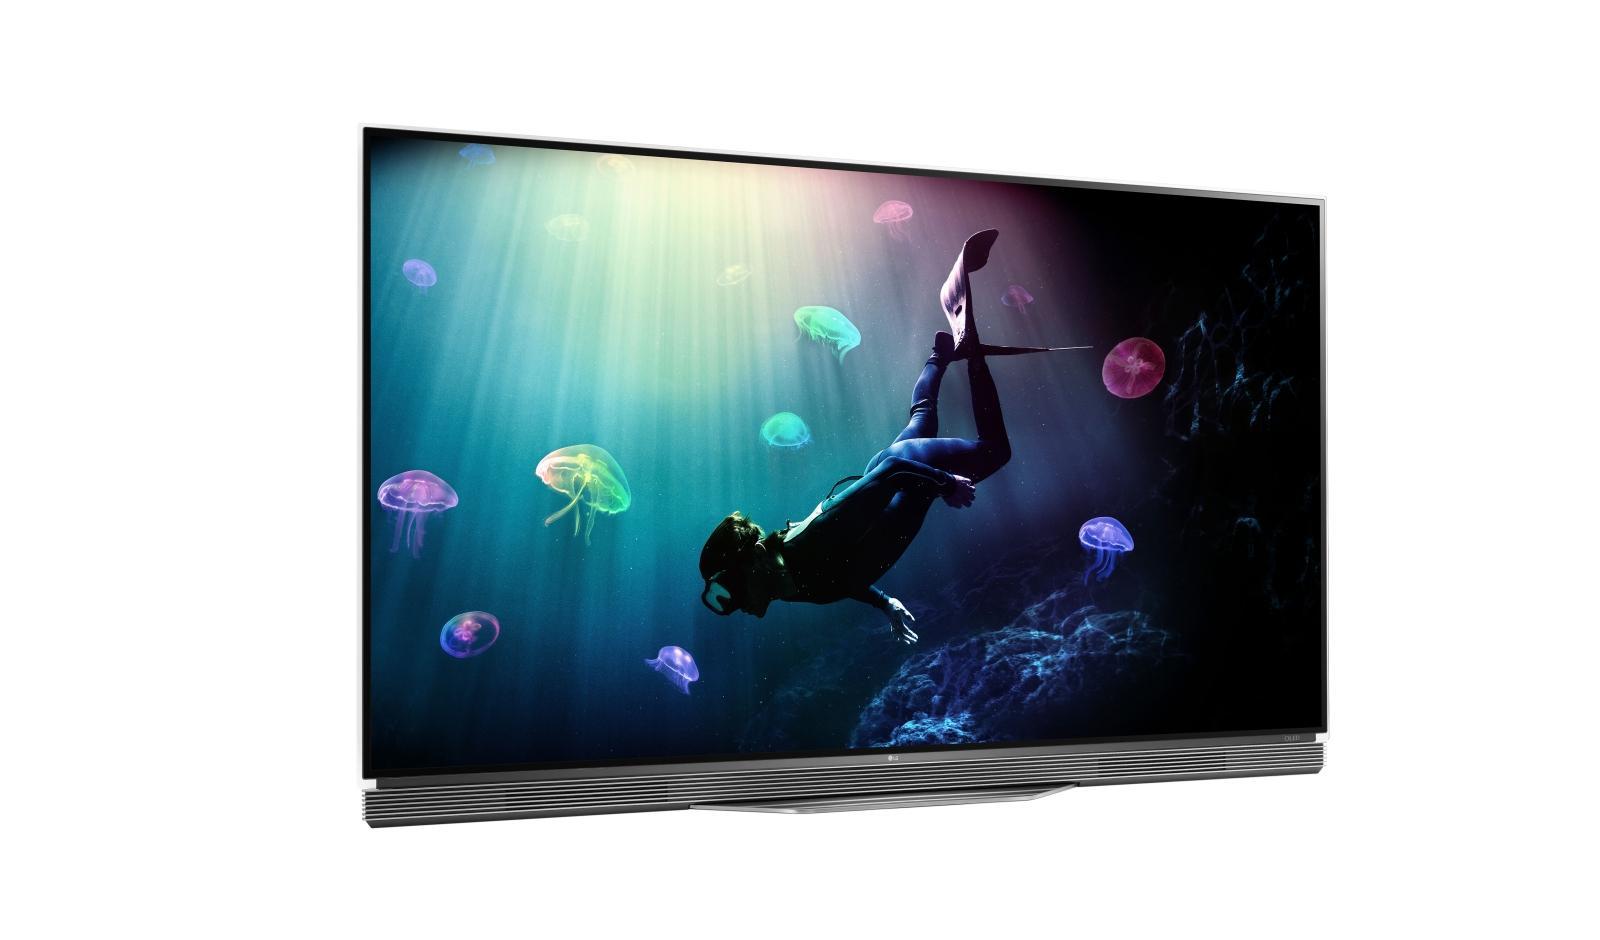 LG OLED55E6P: E6 55 Inch Class OLED 4K HDR Smart TV | LG USA